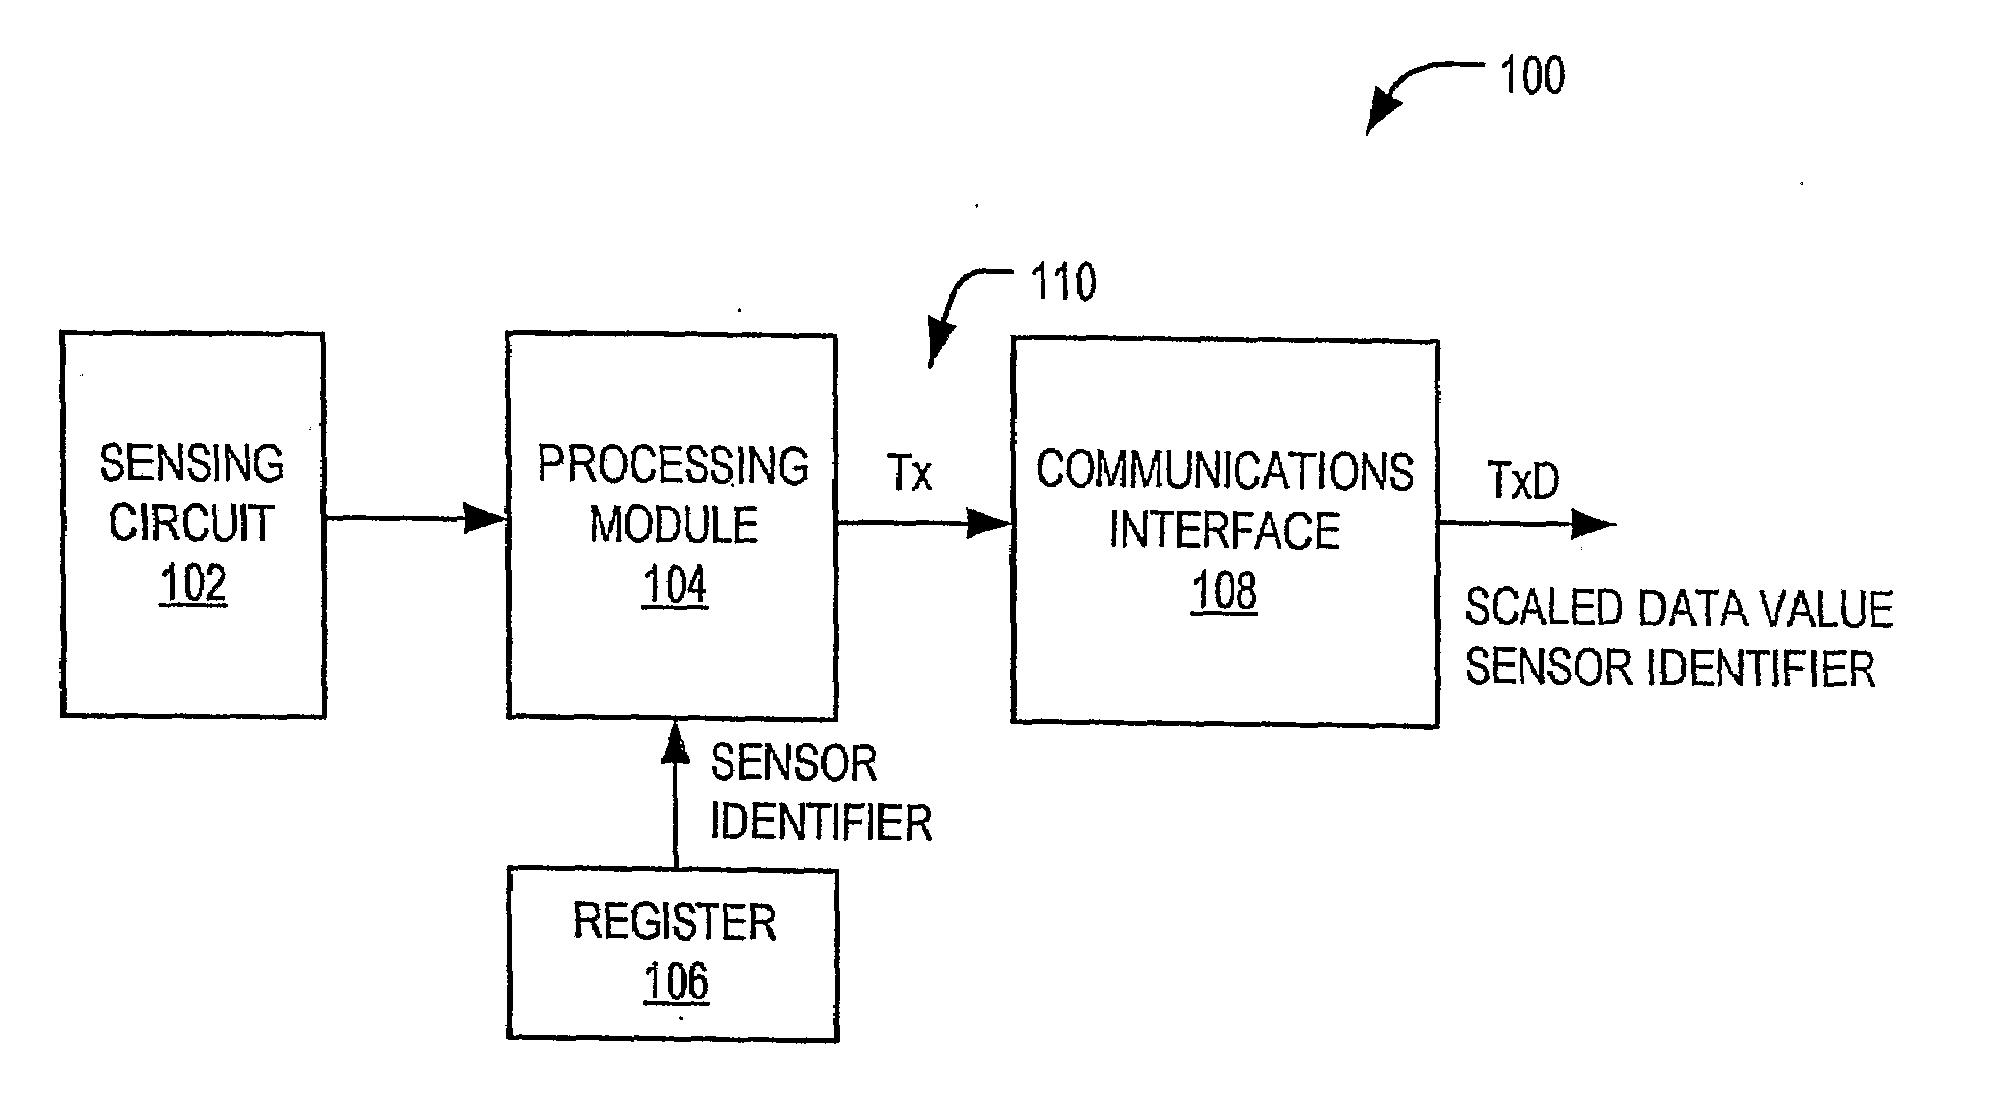 Us20090302870 Soil Moisture Sensor With Data Circuit Patent Drawing